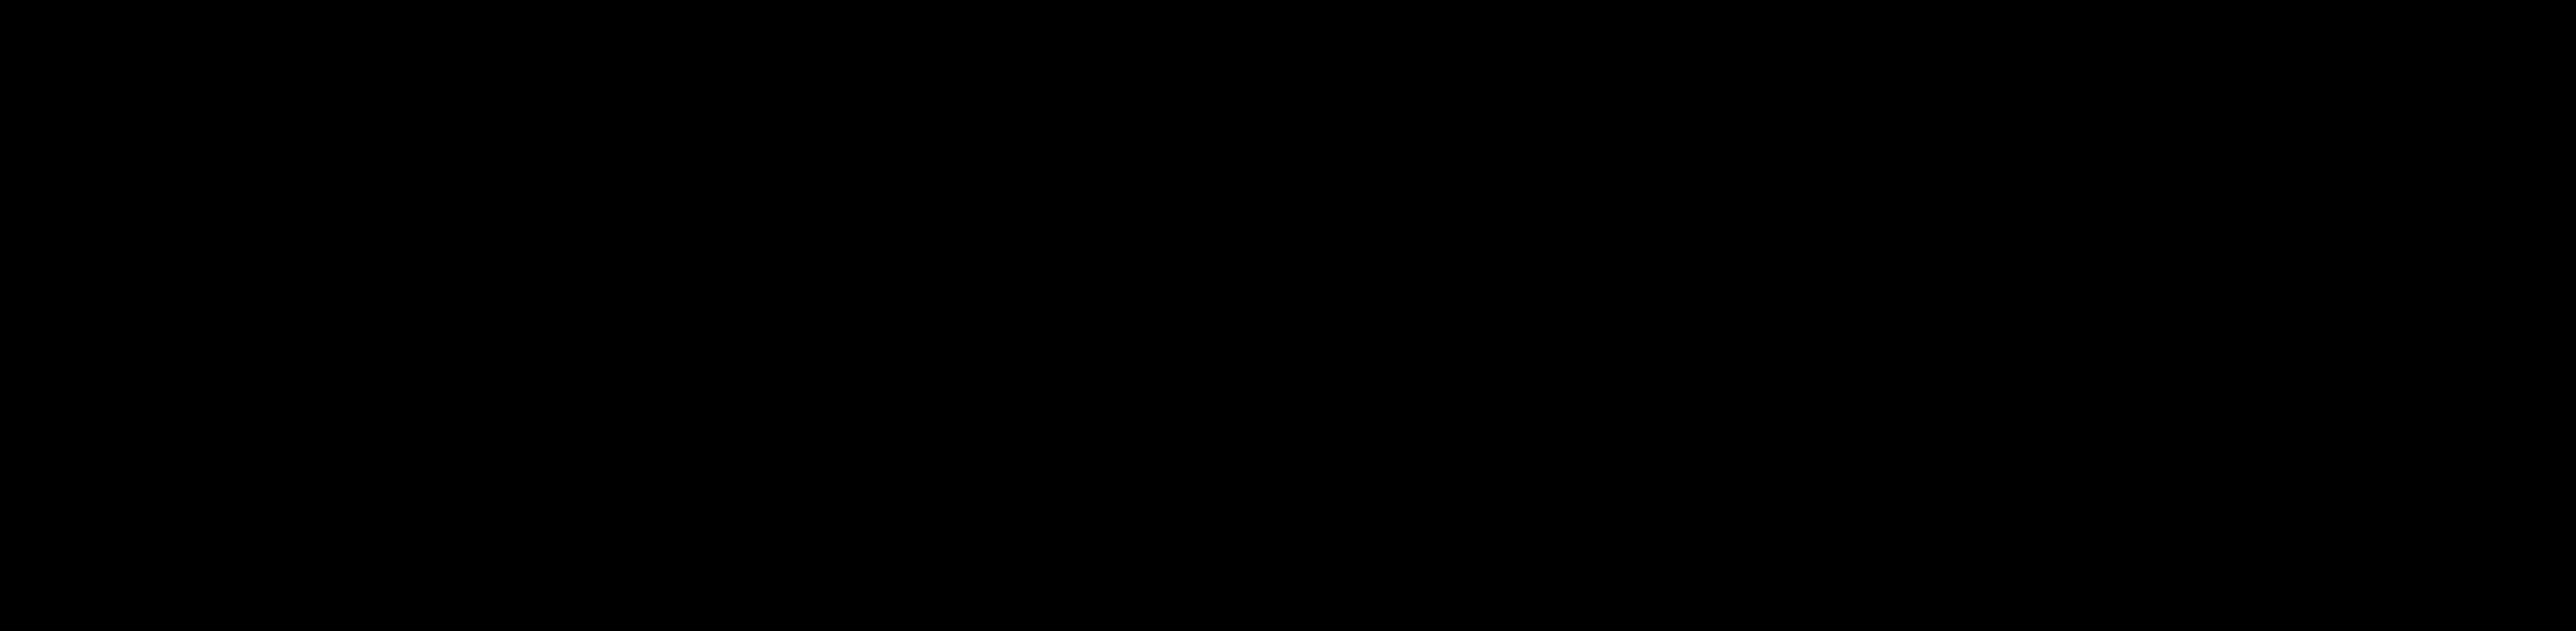 mark-of-trust-ISO-9001-certified-+-ISO-14001-+-ISO-45001-black-logo-En-GB-0320